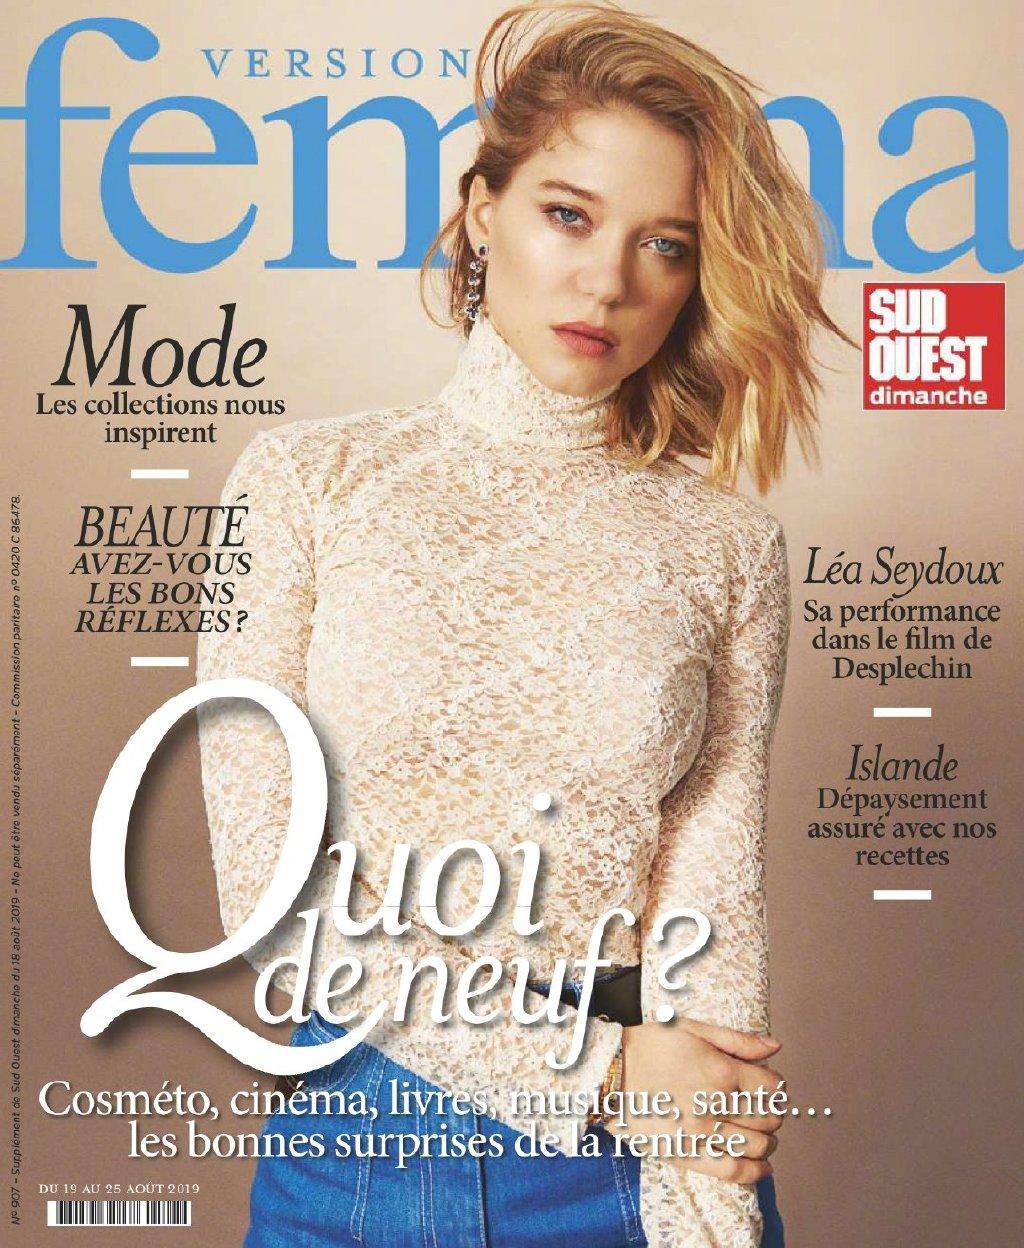 Lea Seydoux - Femina Magazine Cover - 2019